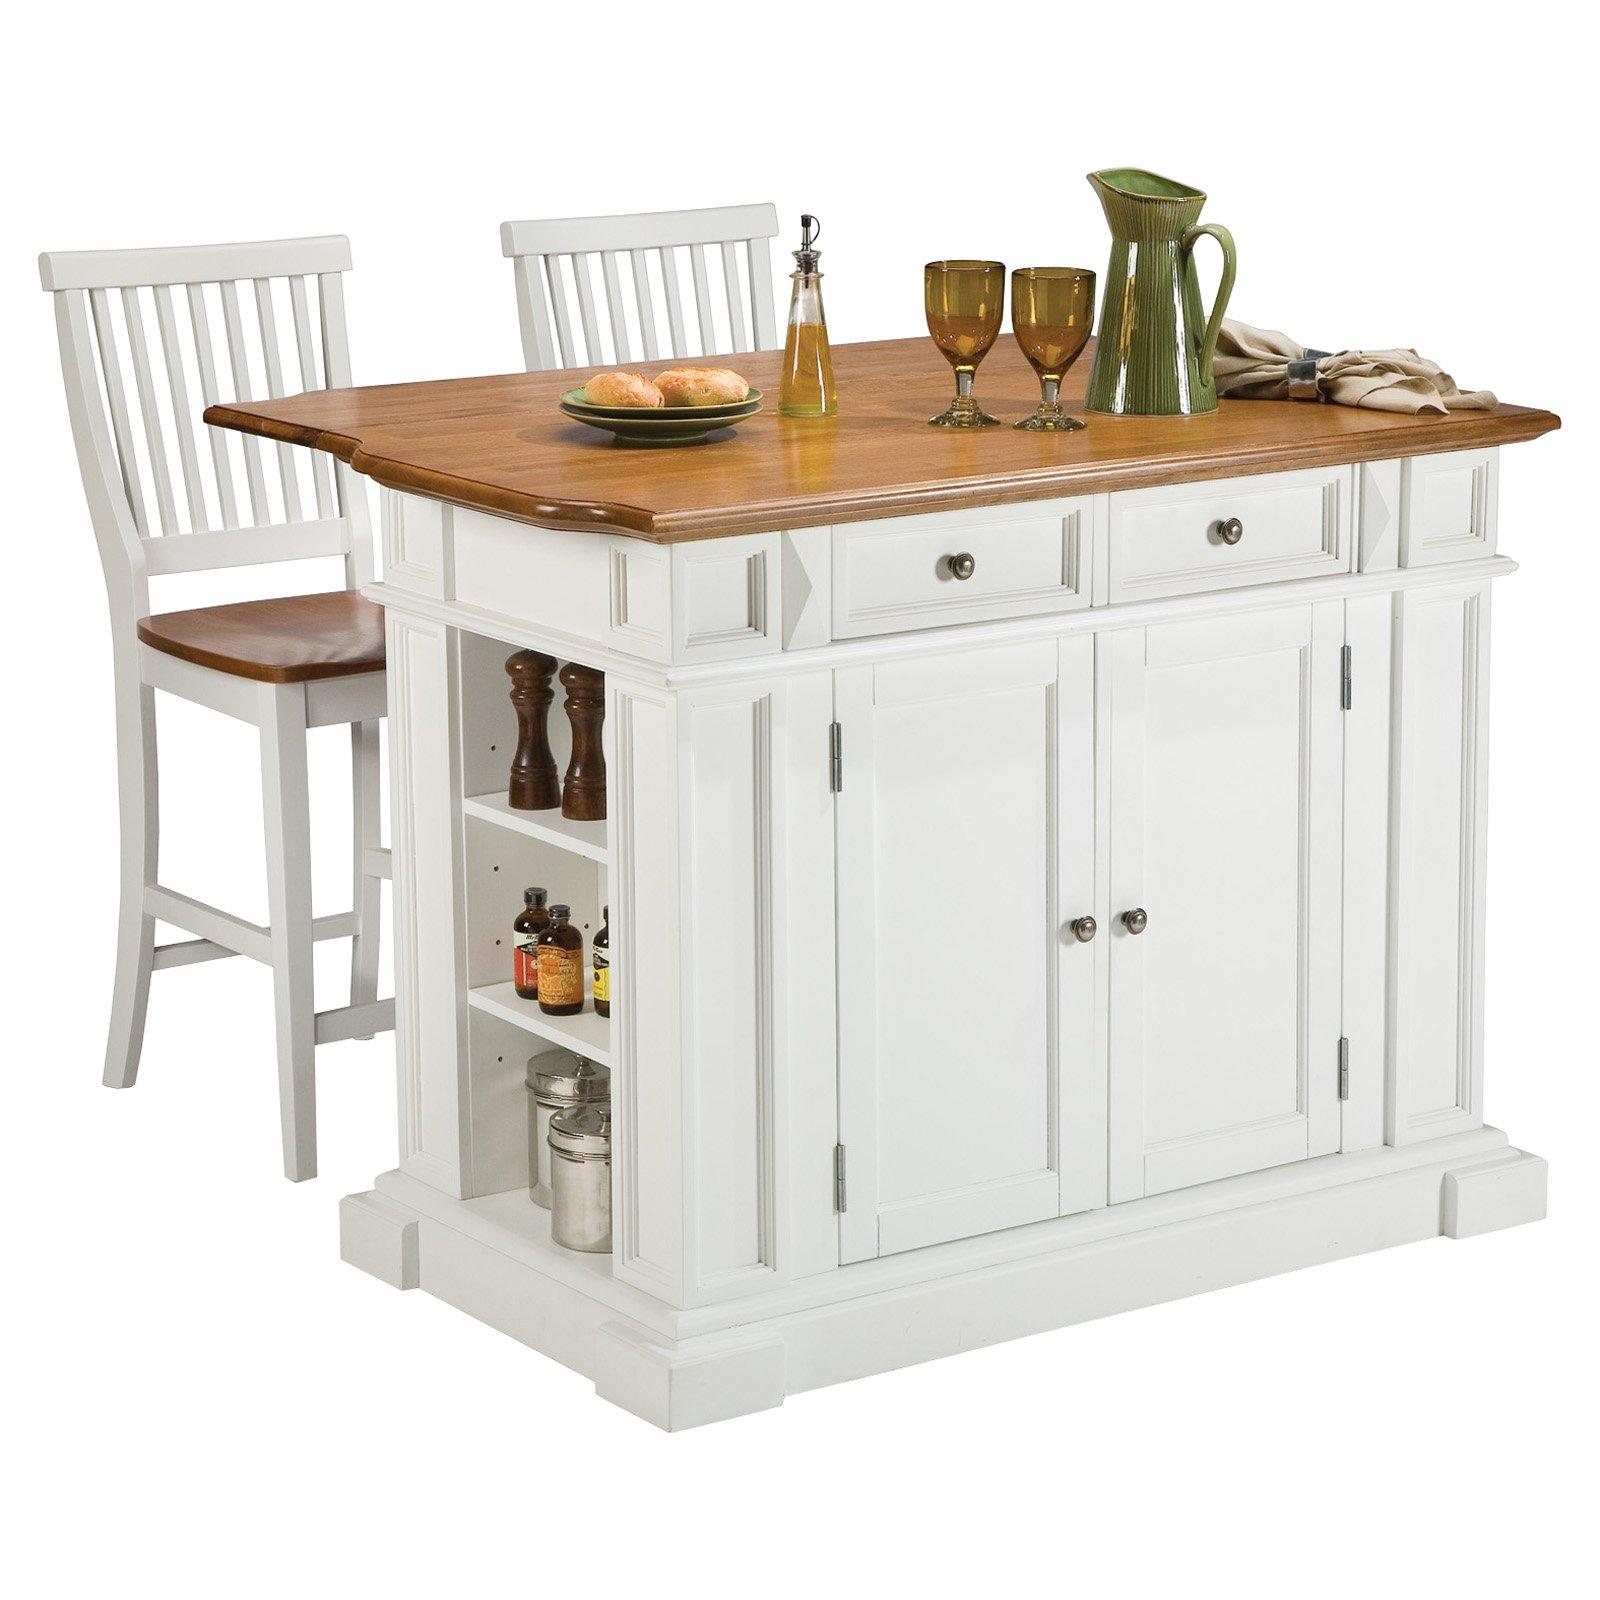 Floating kitchen island – 2 – Kitchen ideas